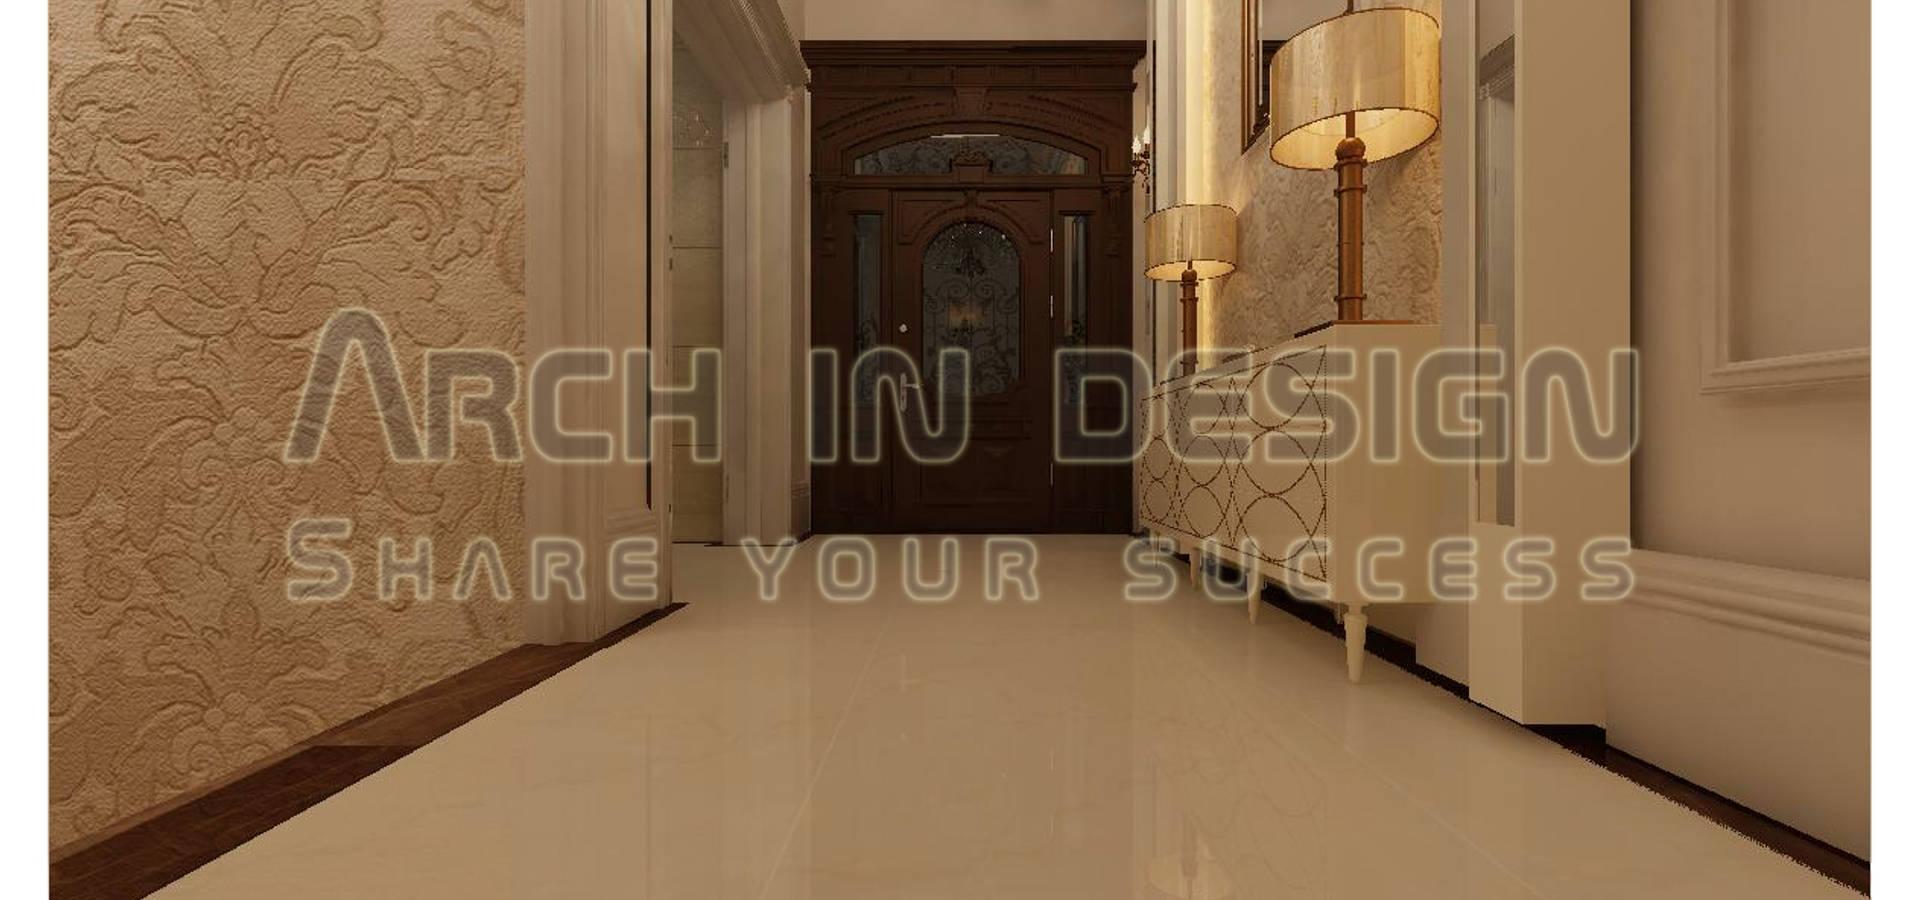 Arch In Design